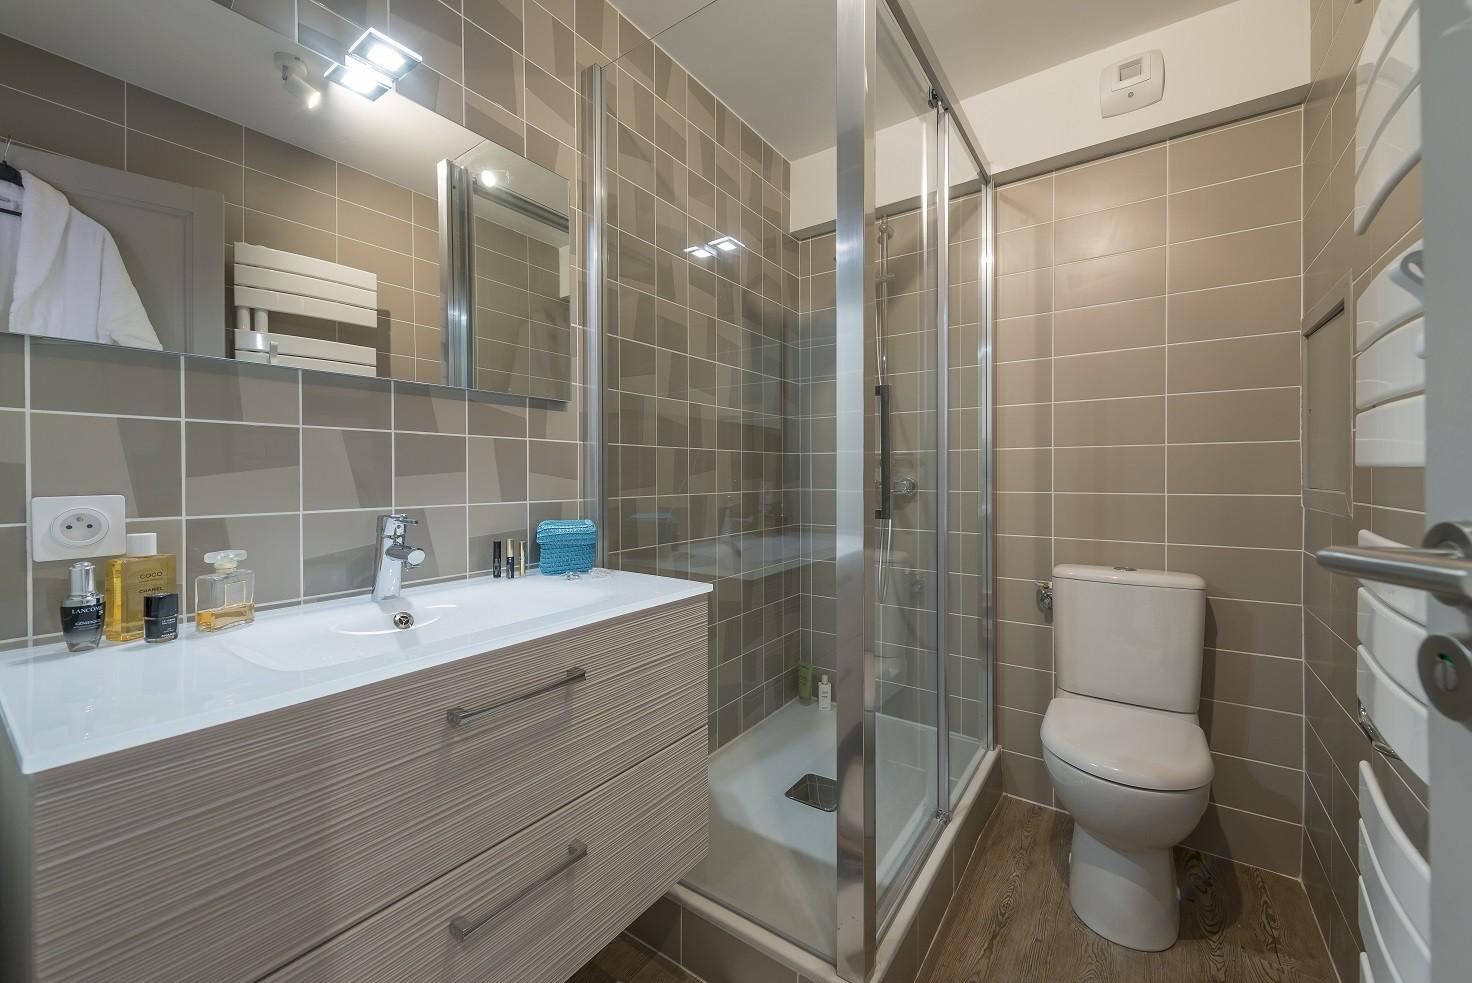 salle-de-bain-1472x983-7709